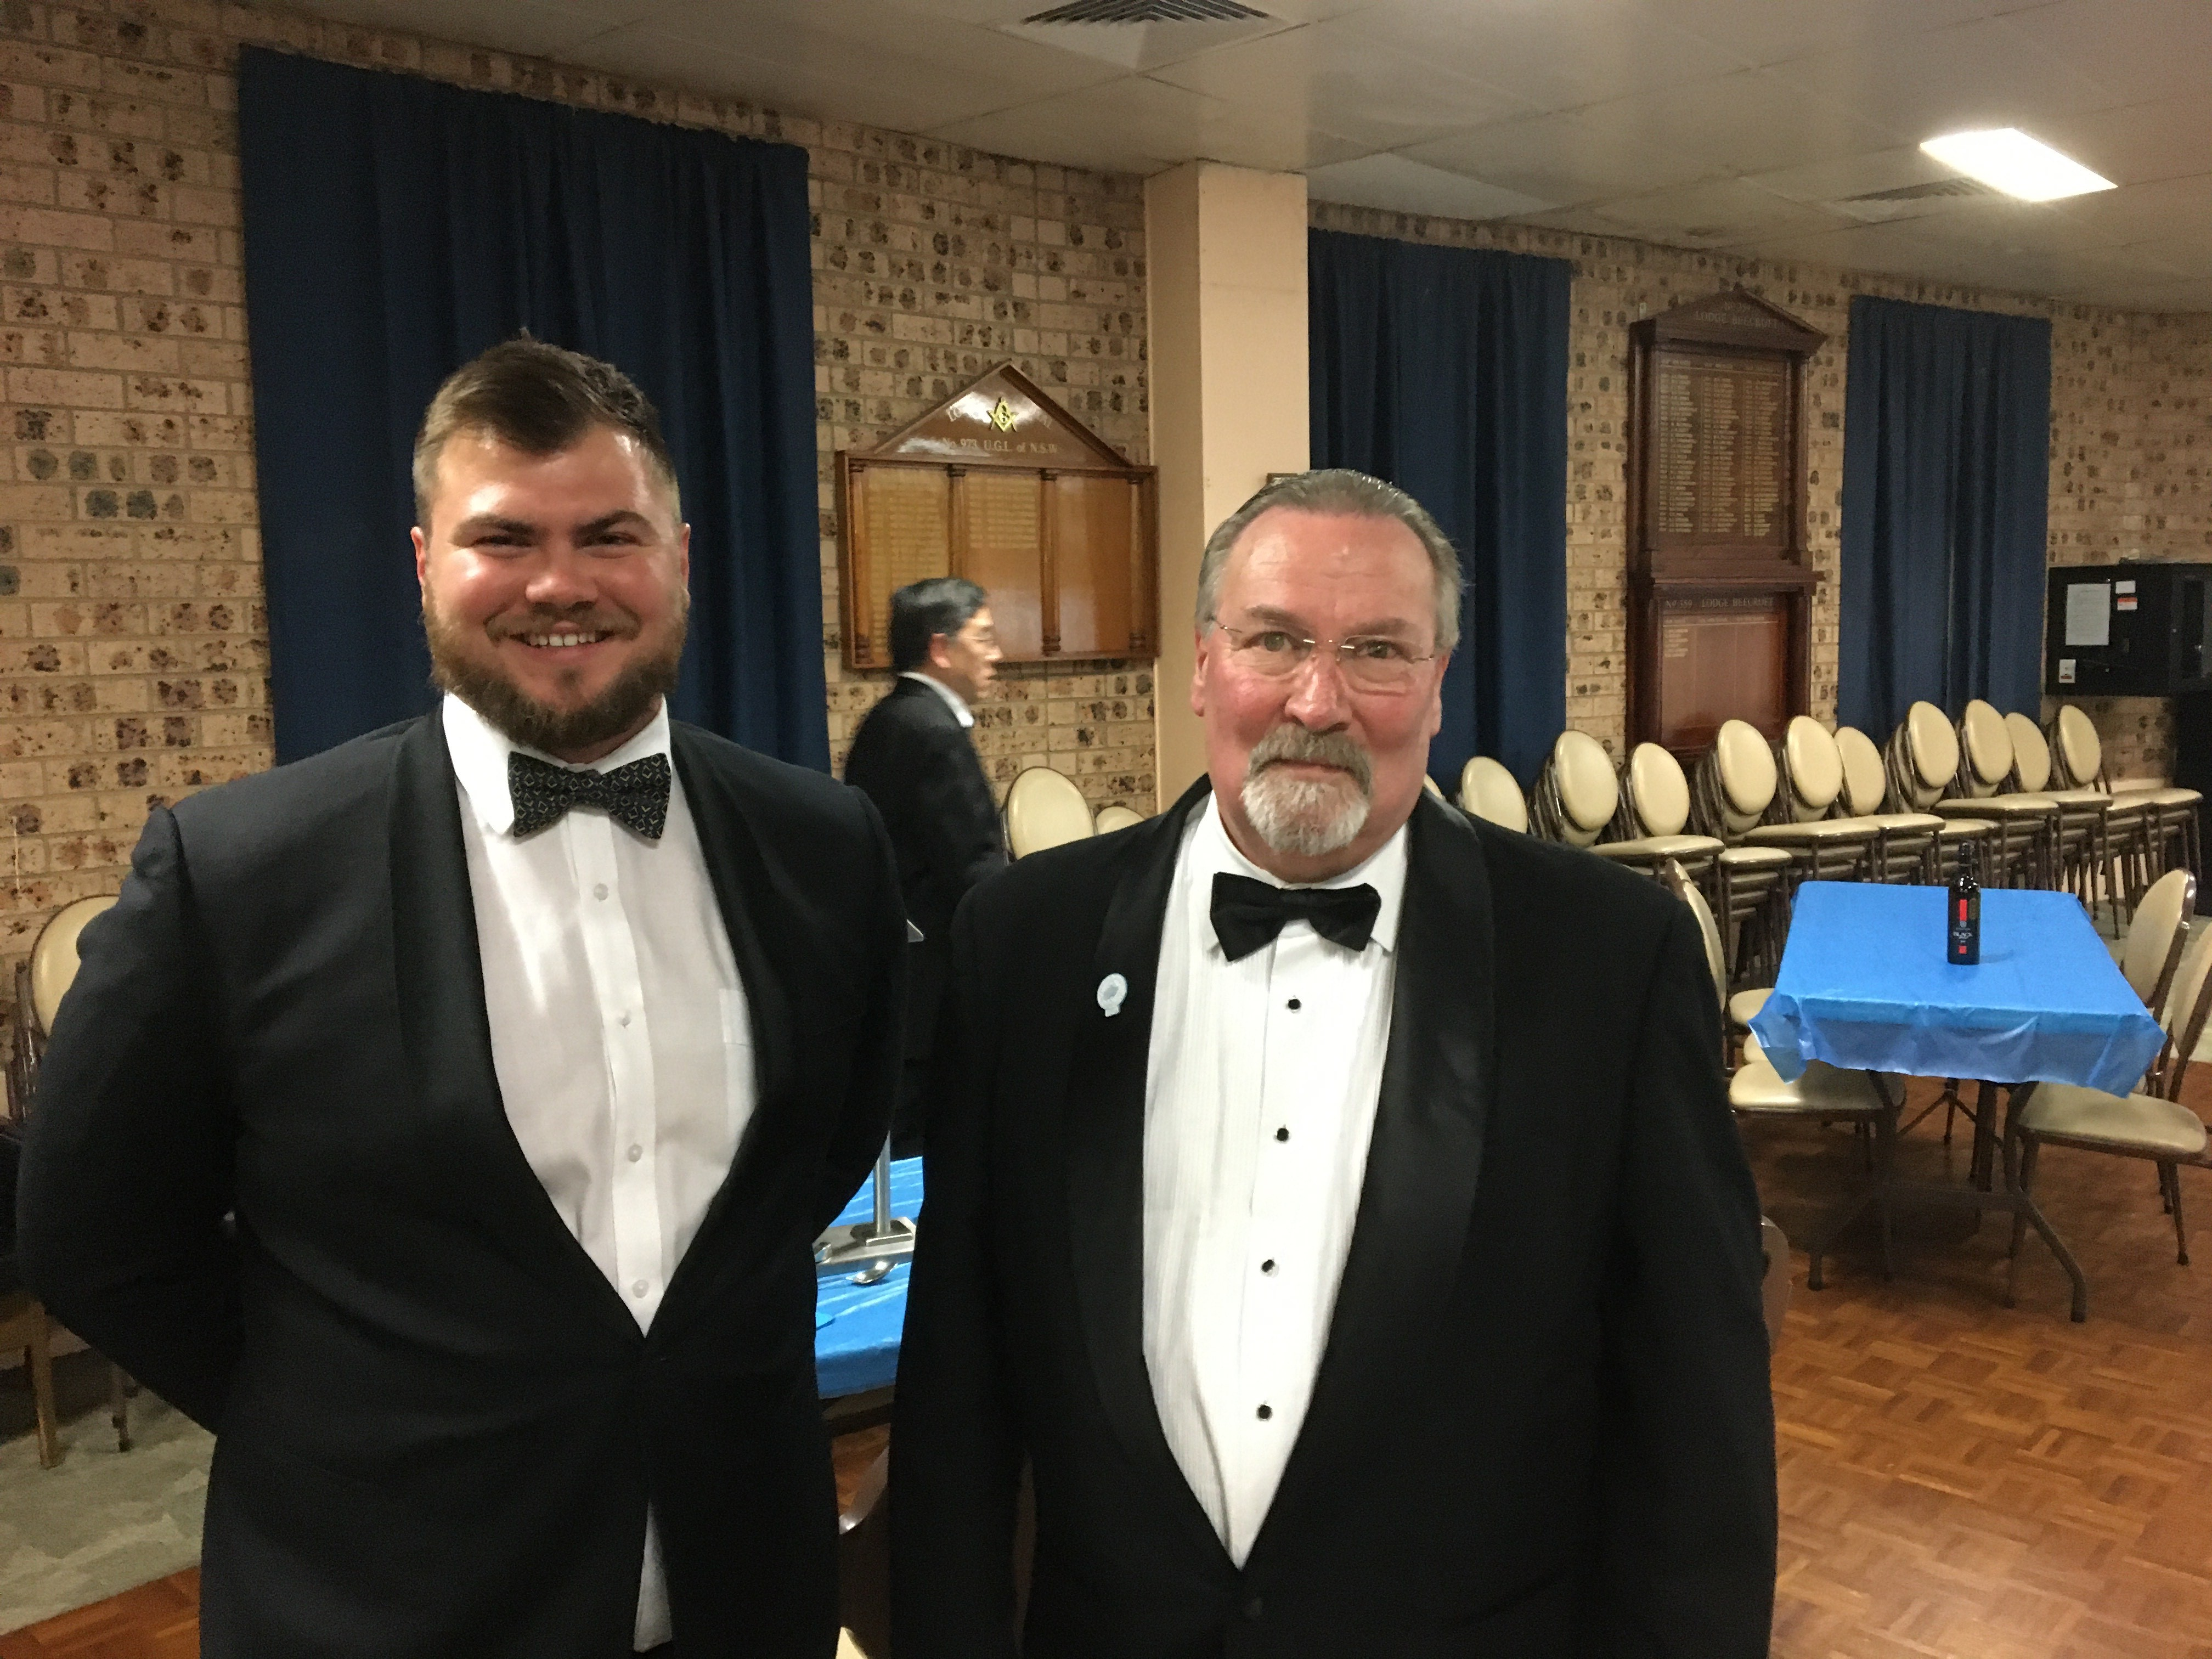 Aussie master and Chris